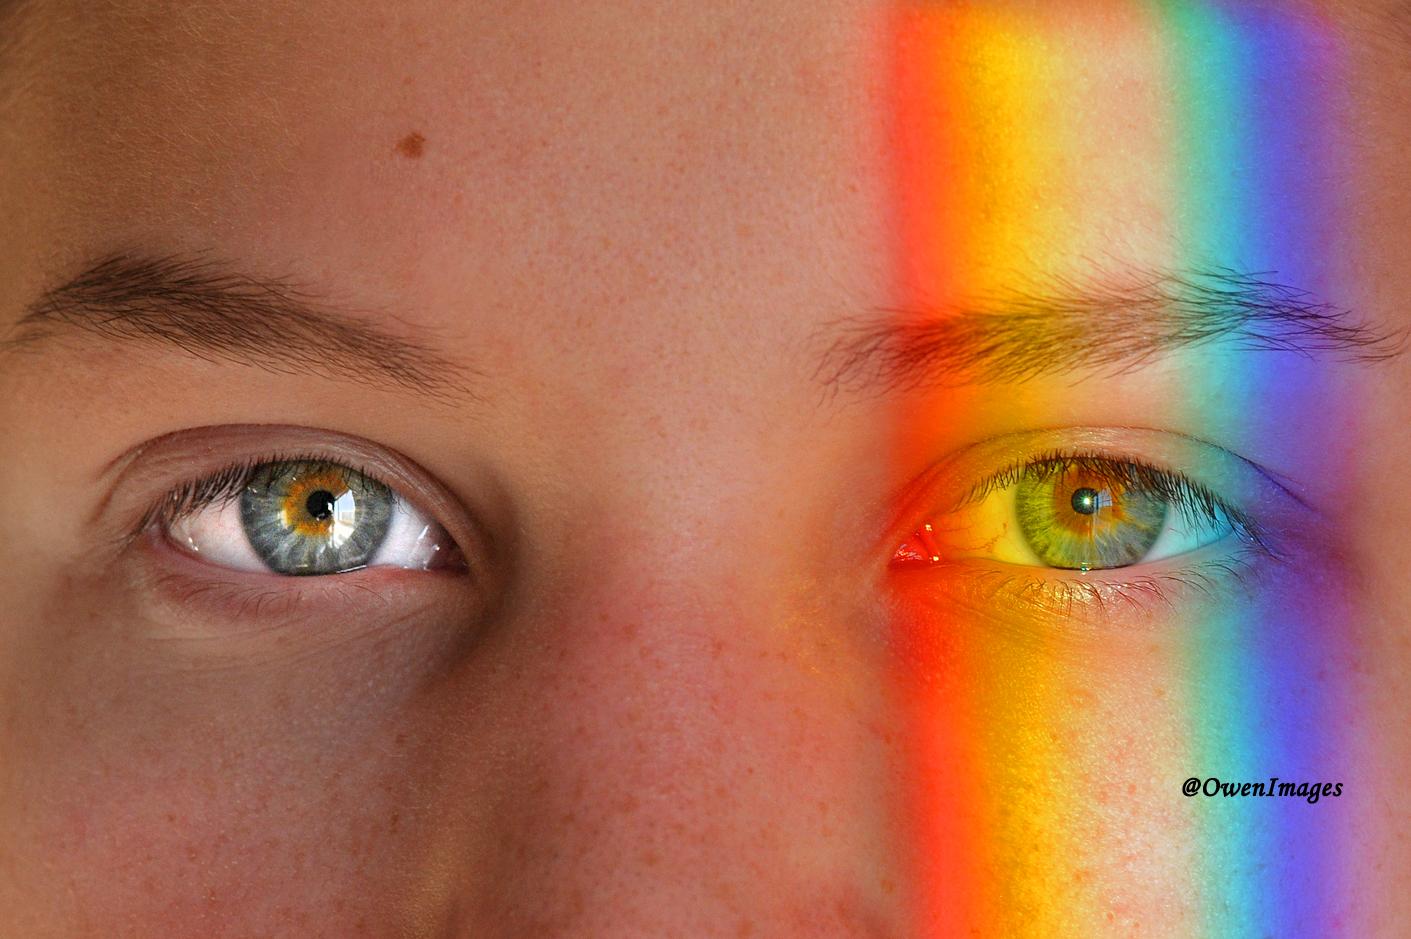 Closeup with prism casting a rainbow